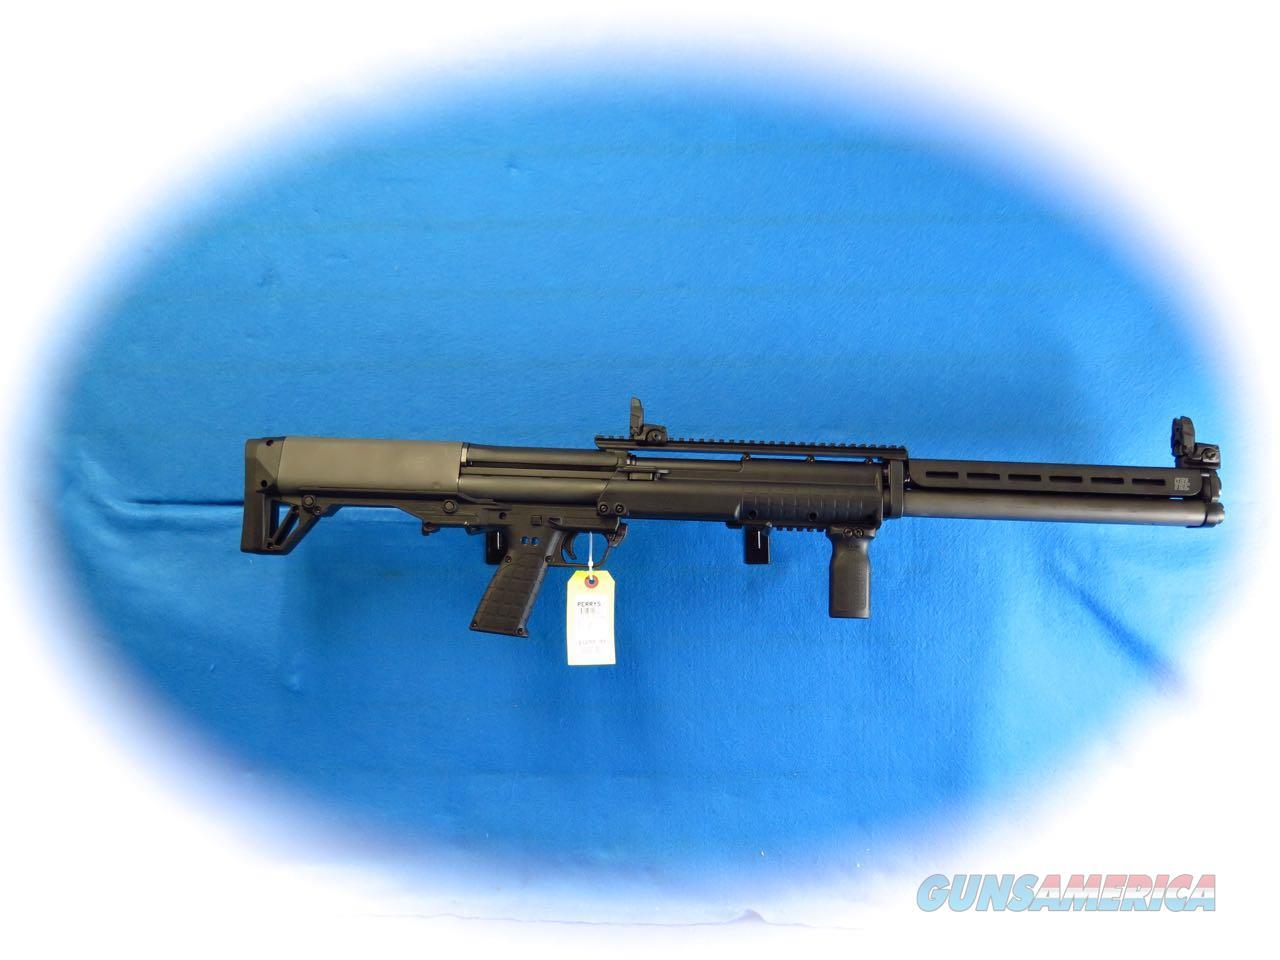 Kel-Tec KSG 12 Ga. Pump Shotgun Model KTKSG25BLK **New**  Guns > Shotguns > Kel-Tec Shotguns > KSG